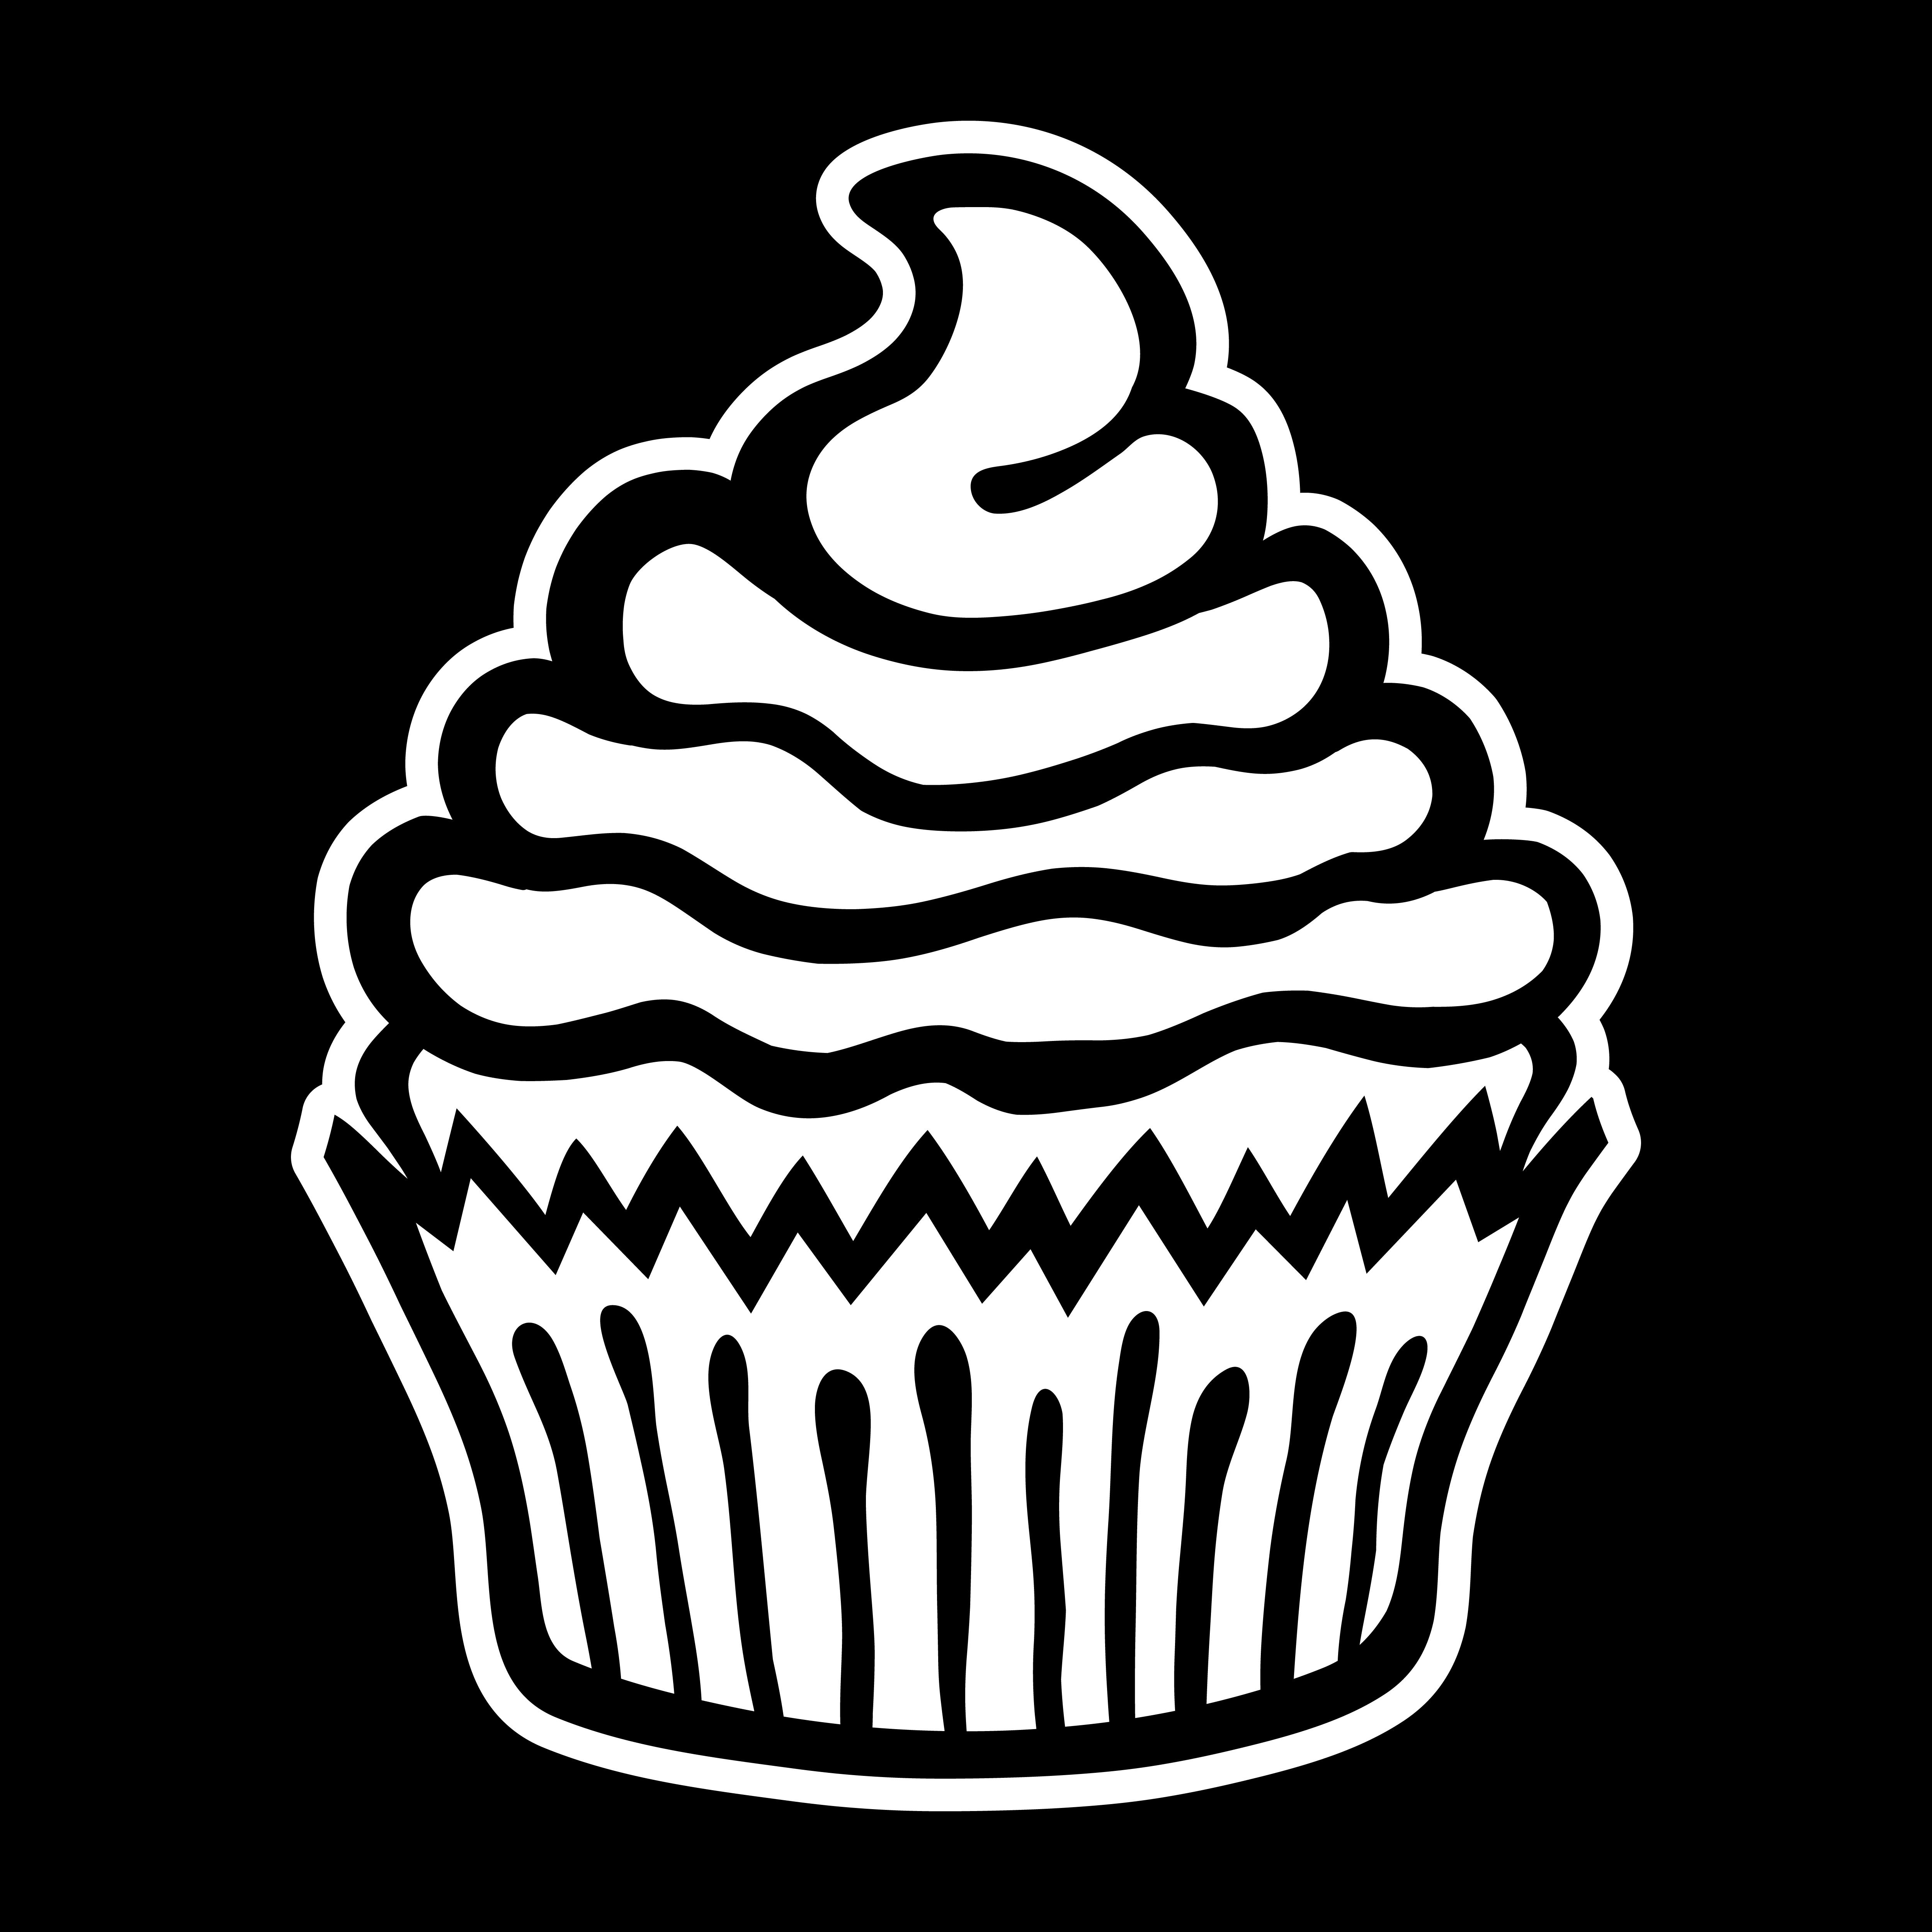 Cupcake Vector Icon Download Free Vector Art Stock